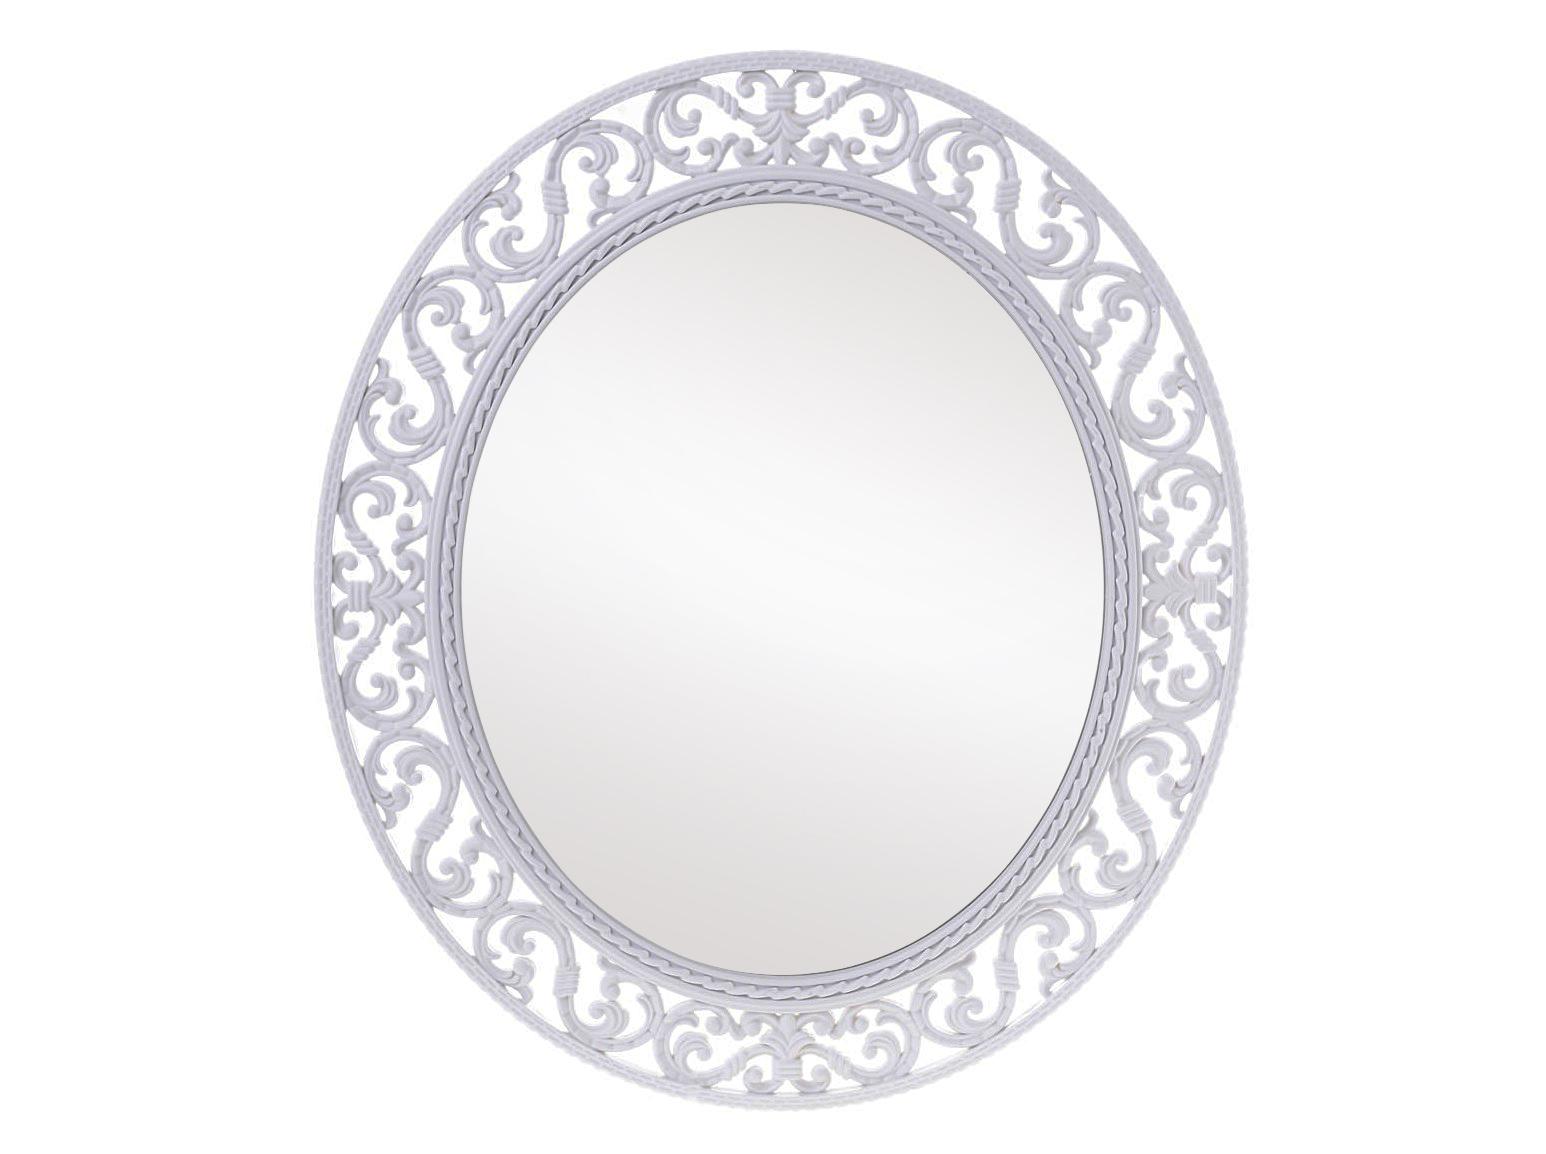 Зеркало настенное SerpaНастенные зеркала<br><br><br>Material: Пластик<br>Ширина см: 35.0<br>Высота см: 40.0<br>Глубина см: 3.0